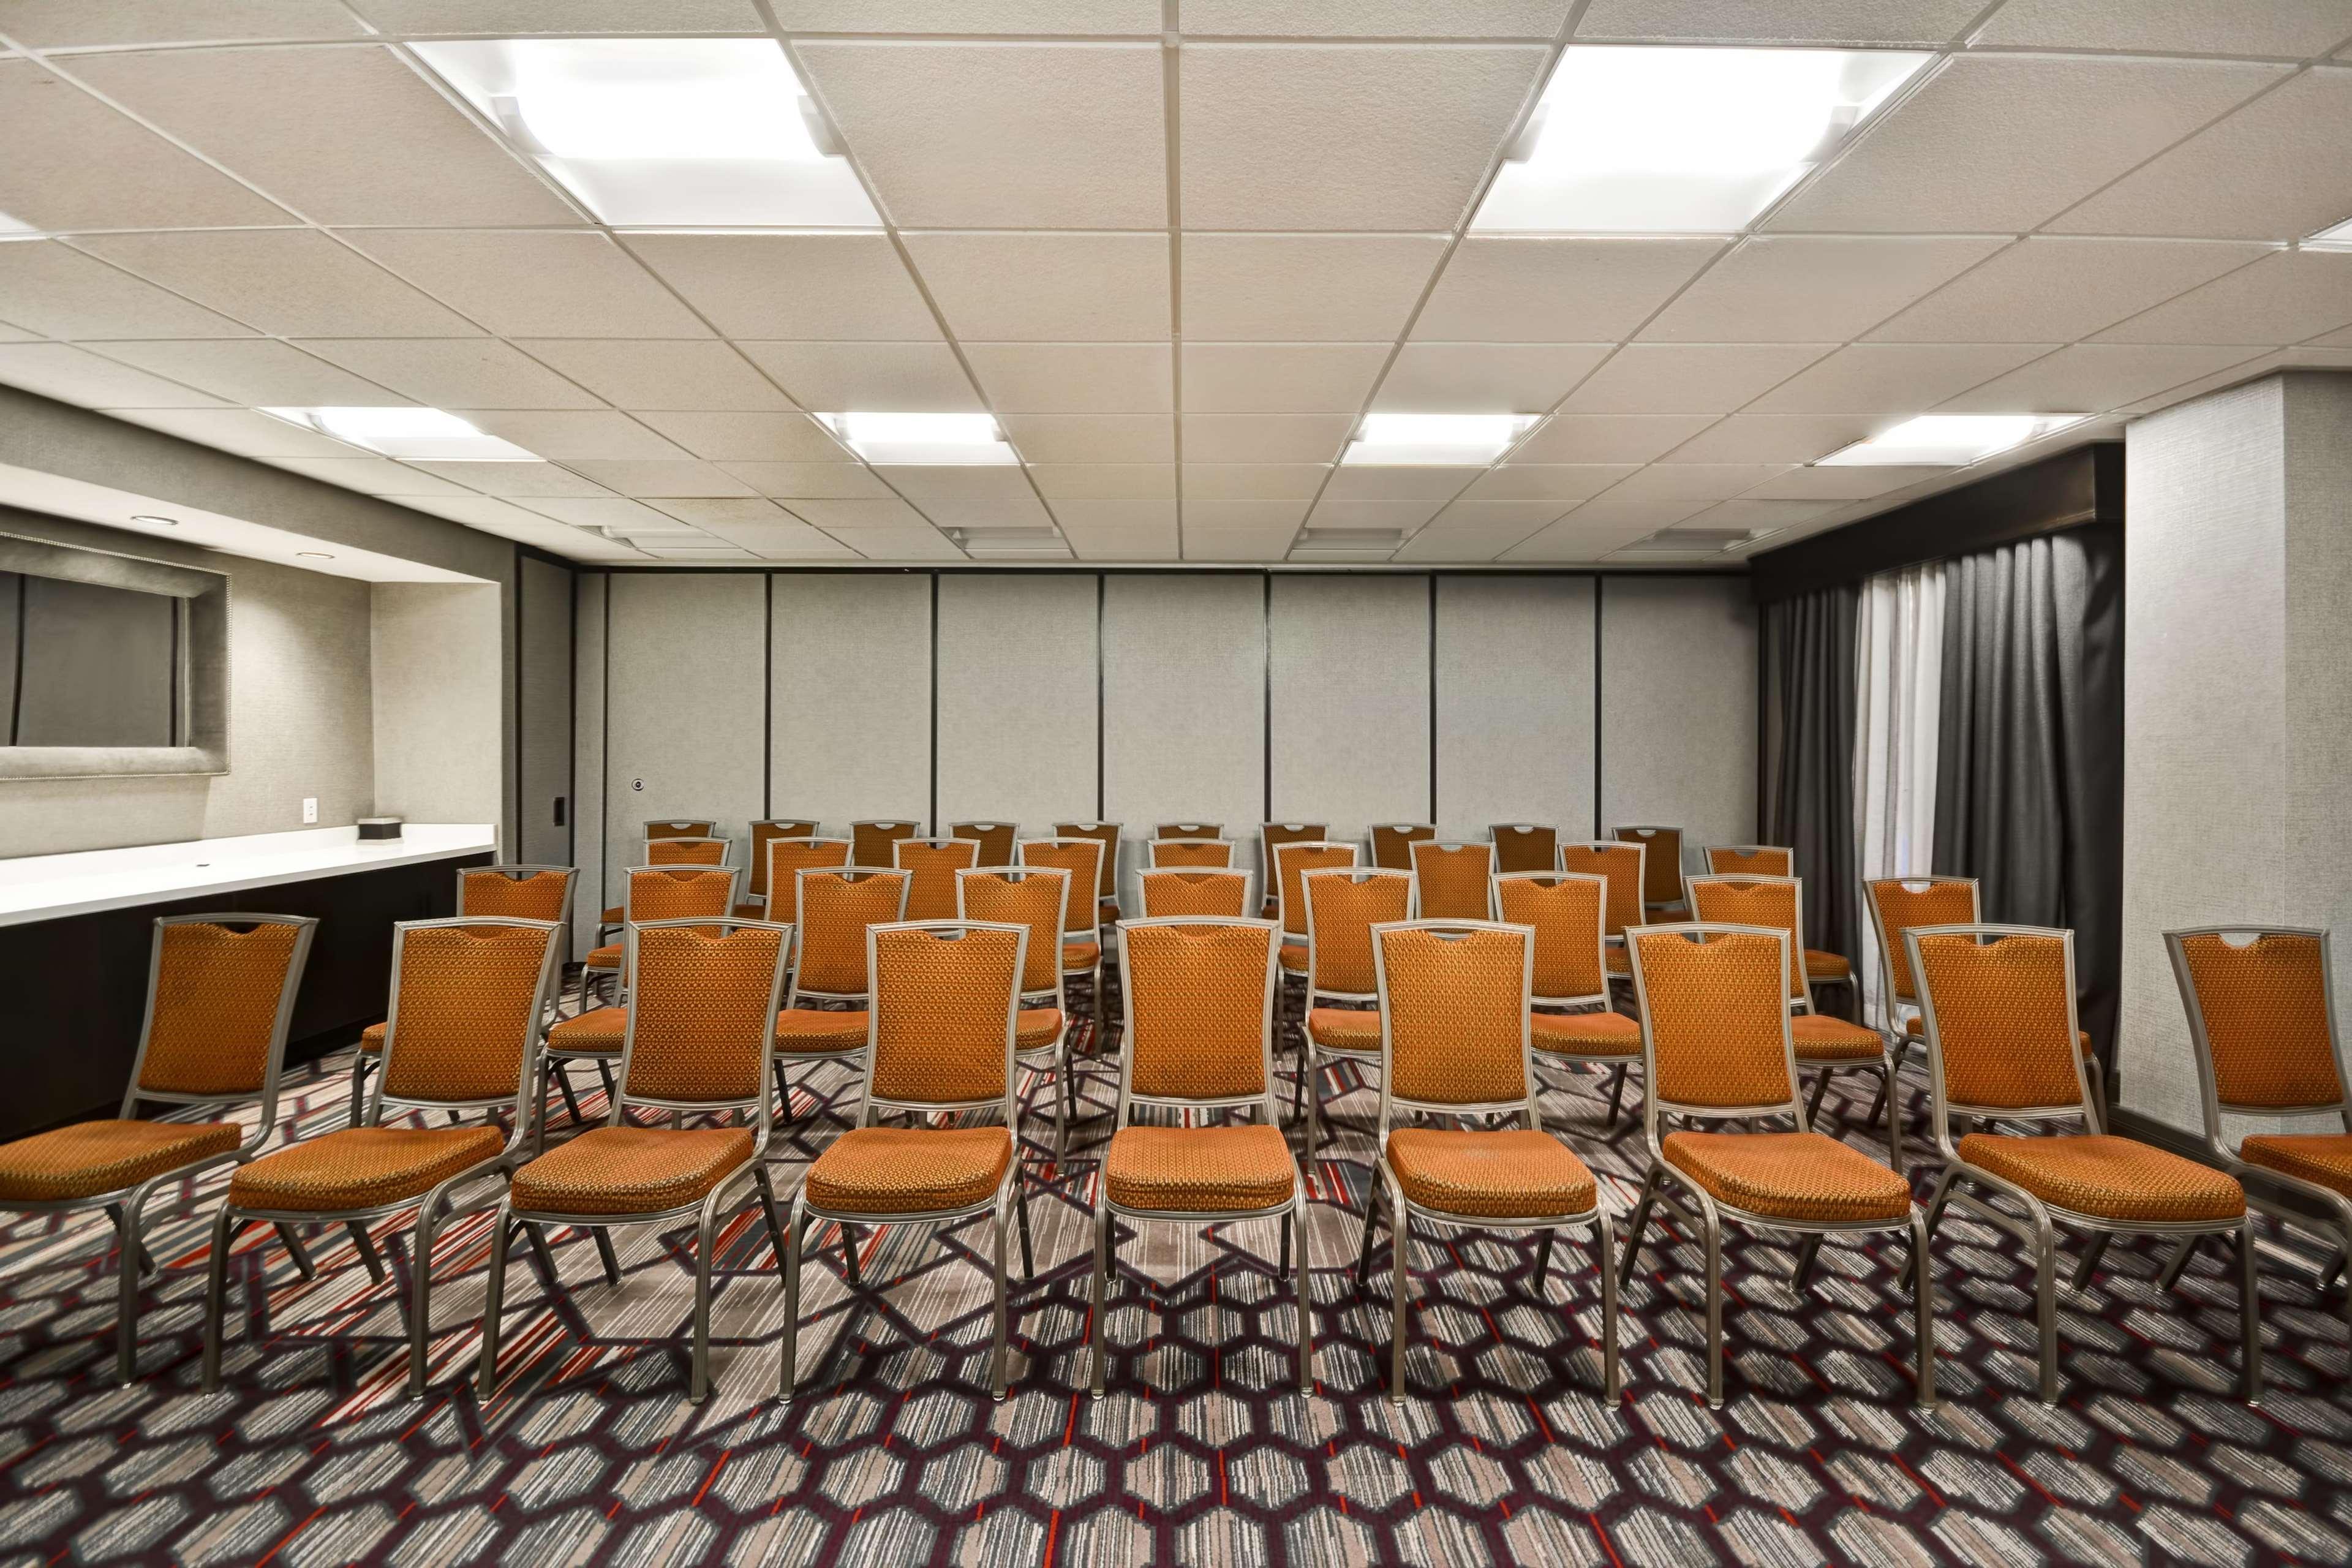 Hampton Inn & Suites Columbus-Easton Area image 61